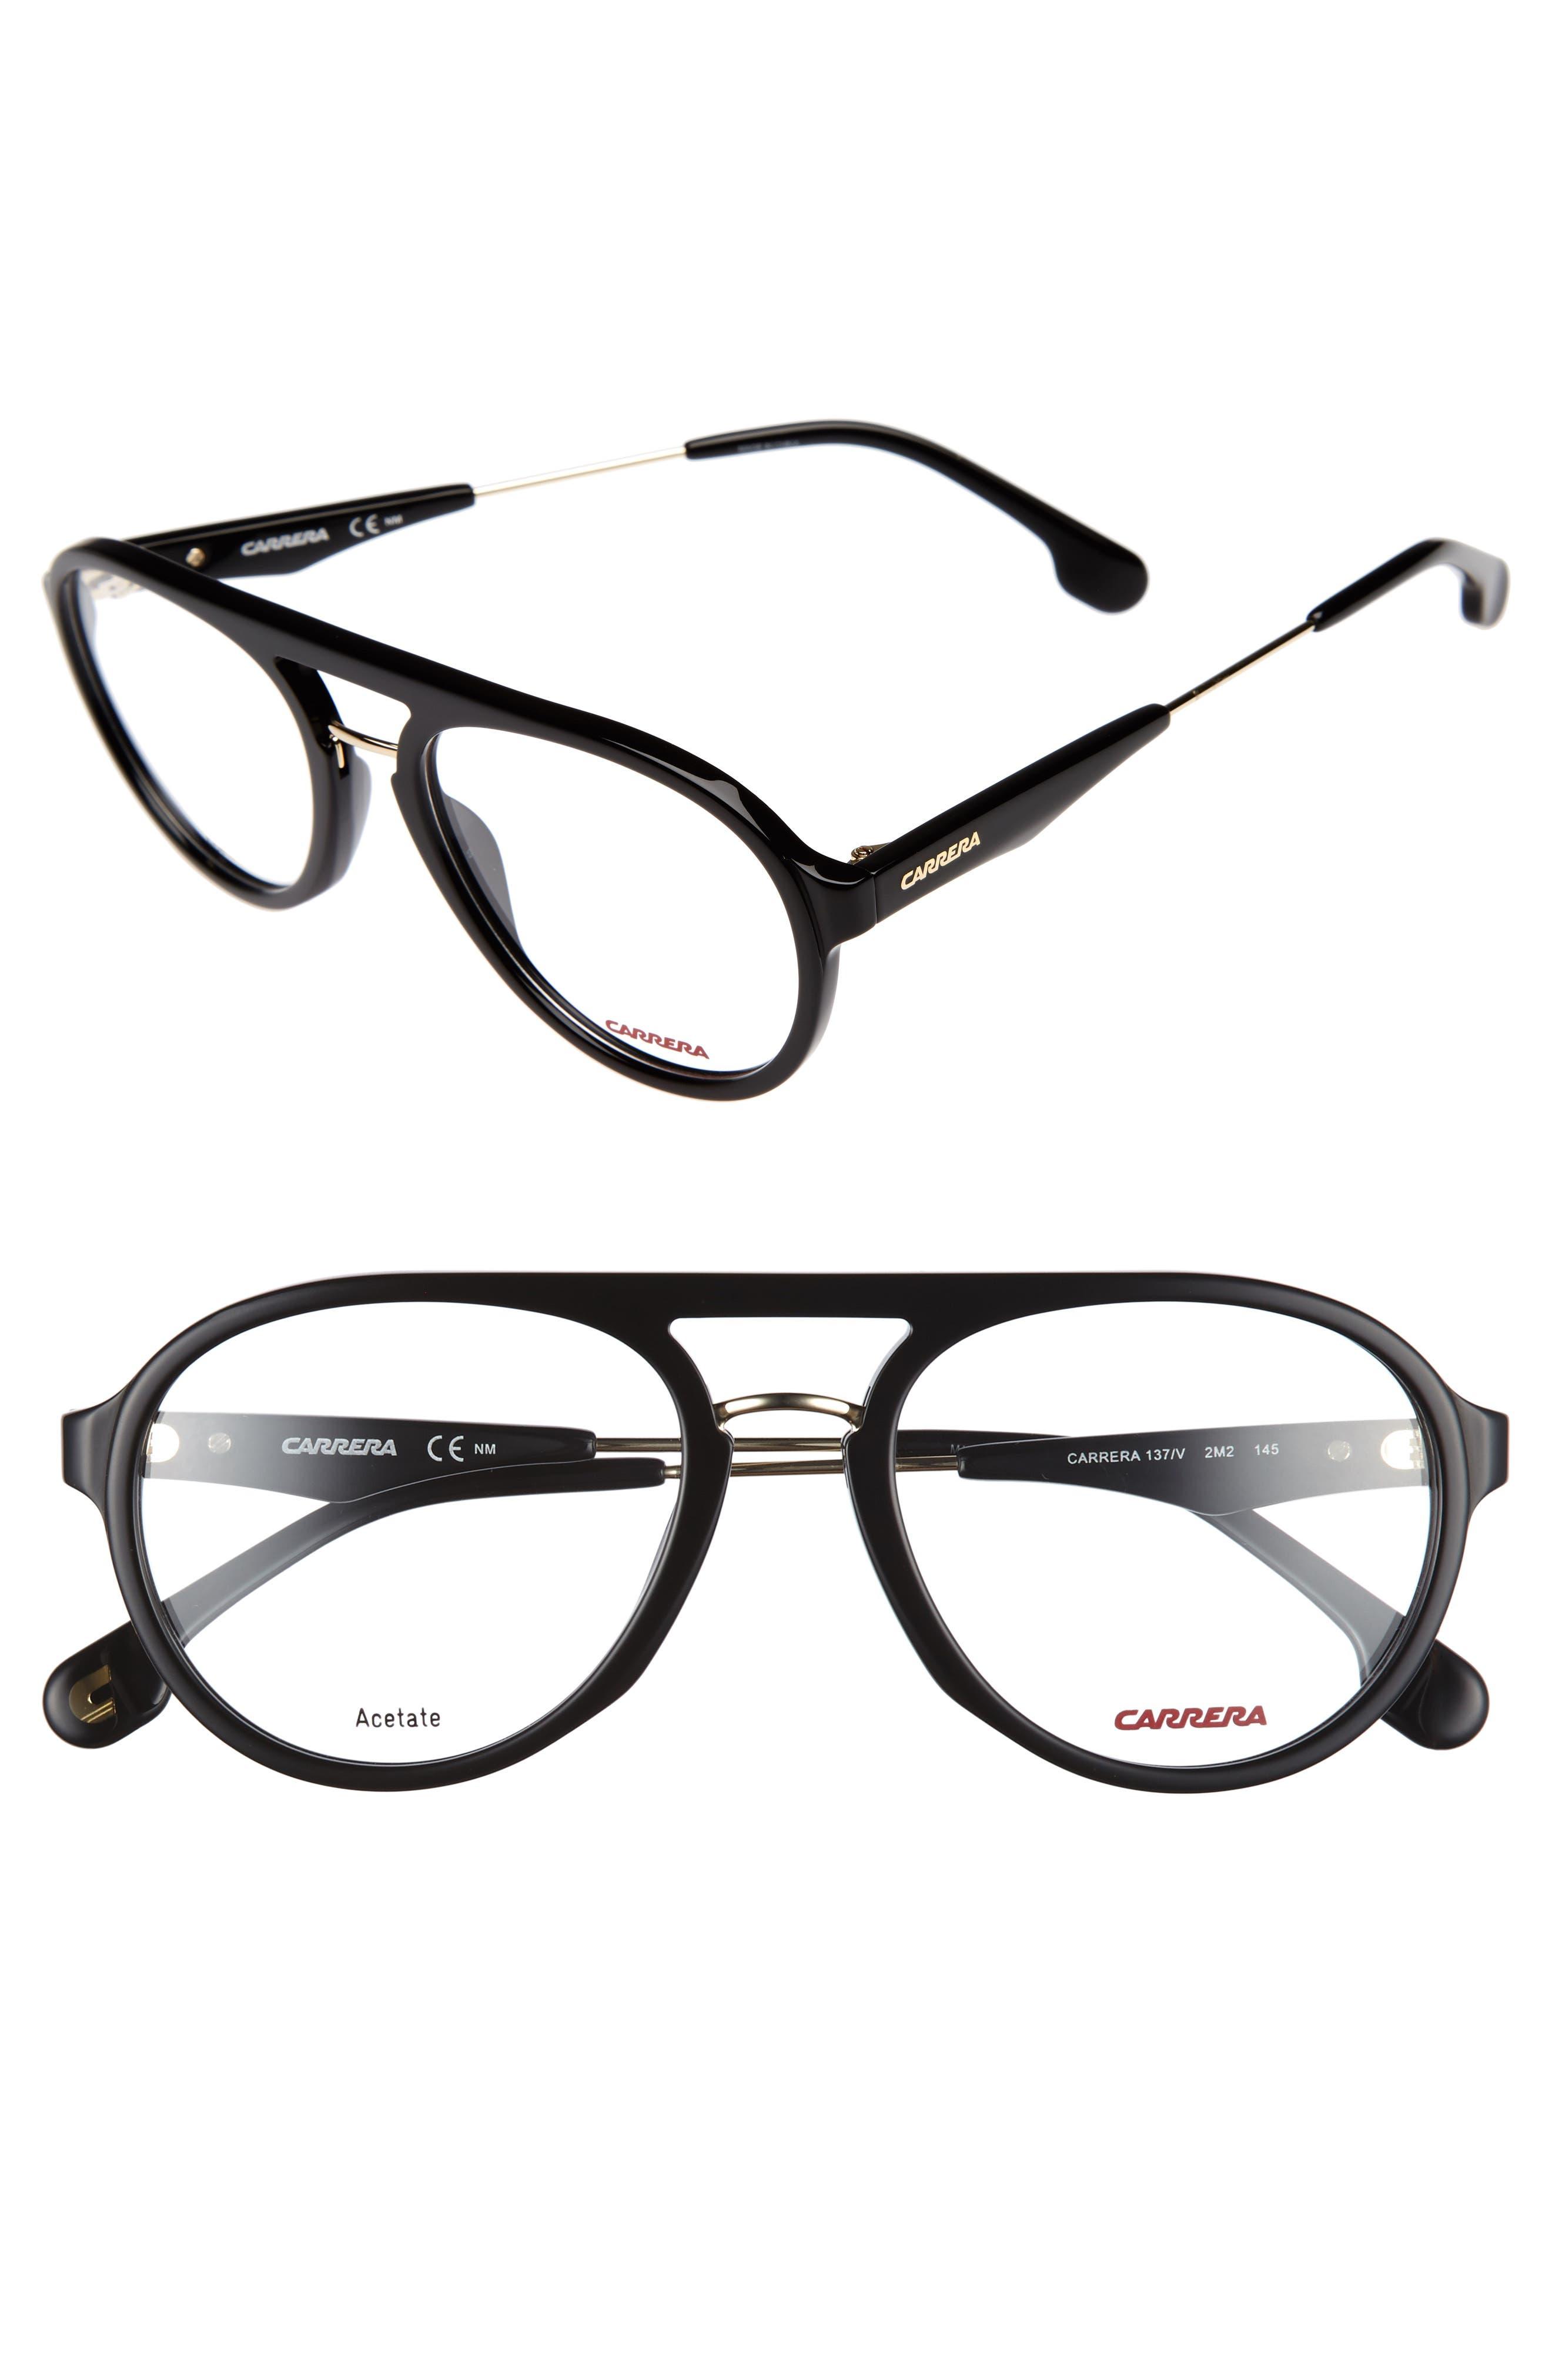 Carrera Eyewear 52mm Aviator Optical Glasses